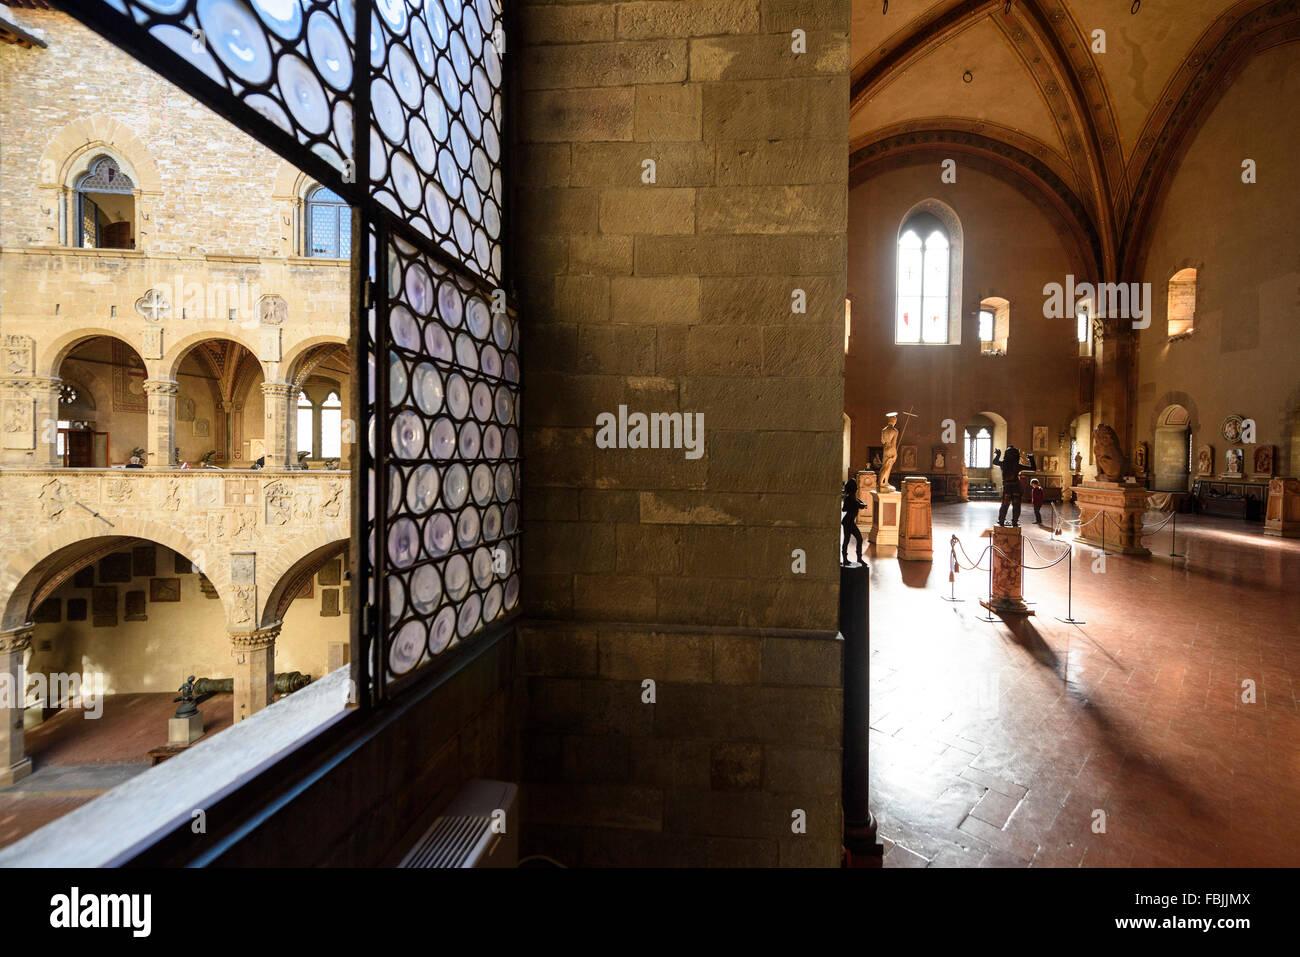 Florence. L'Italie. Cour intérieure et Salone di Donatello, Museo Nazionale del Bargello. Photo Stock